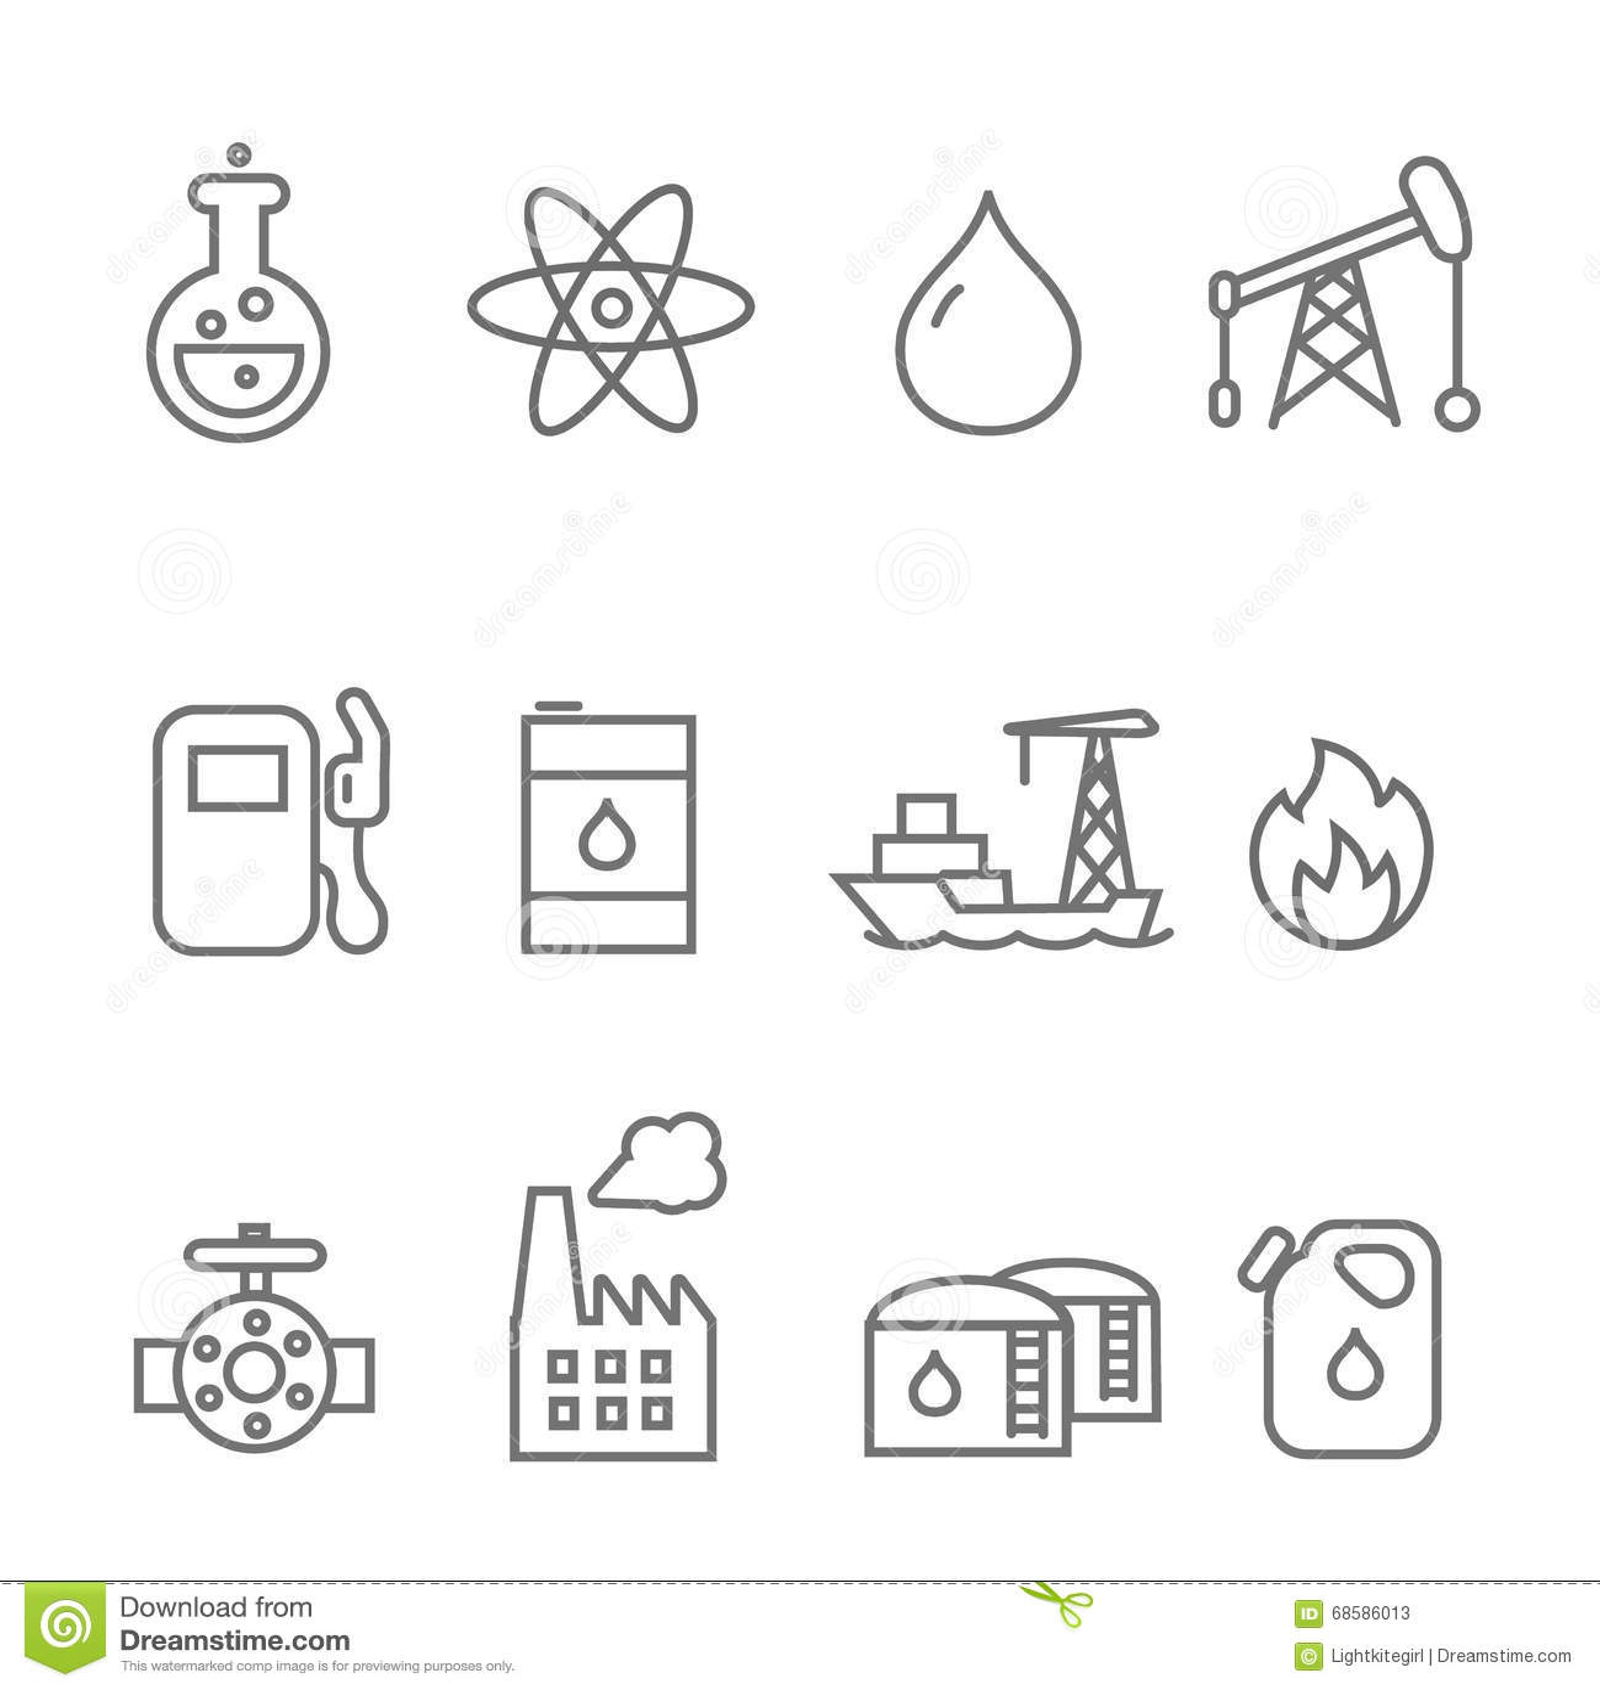 oil industry icon set vector illustration